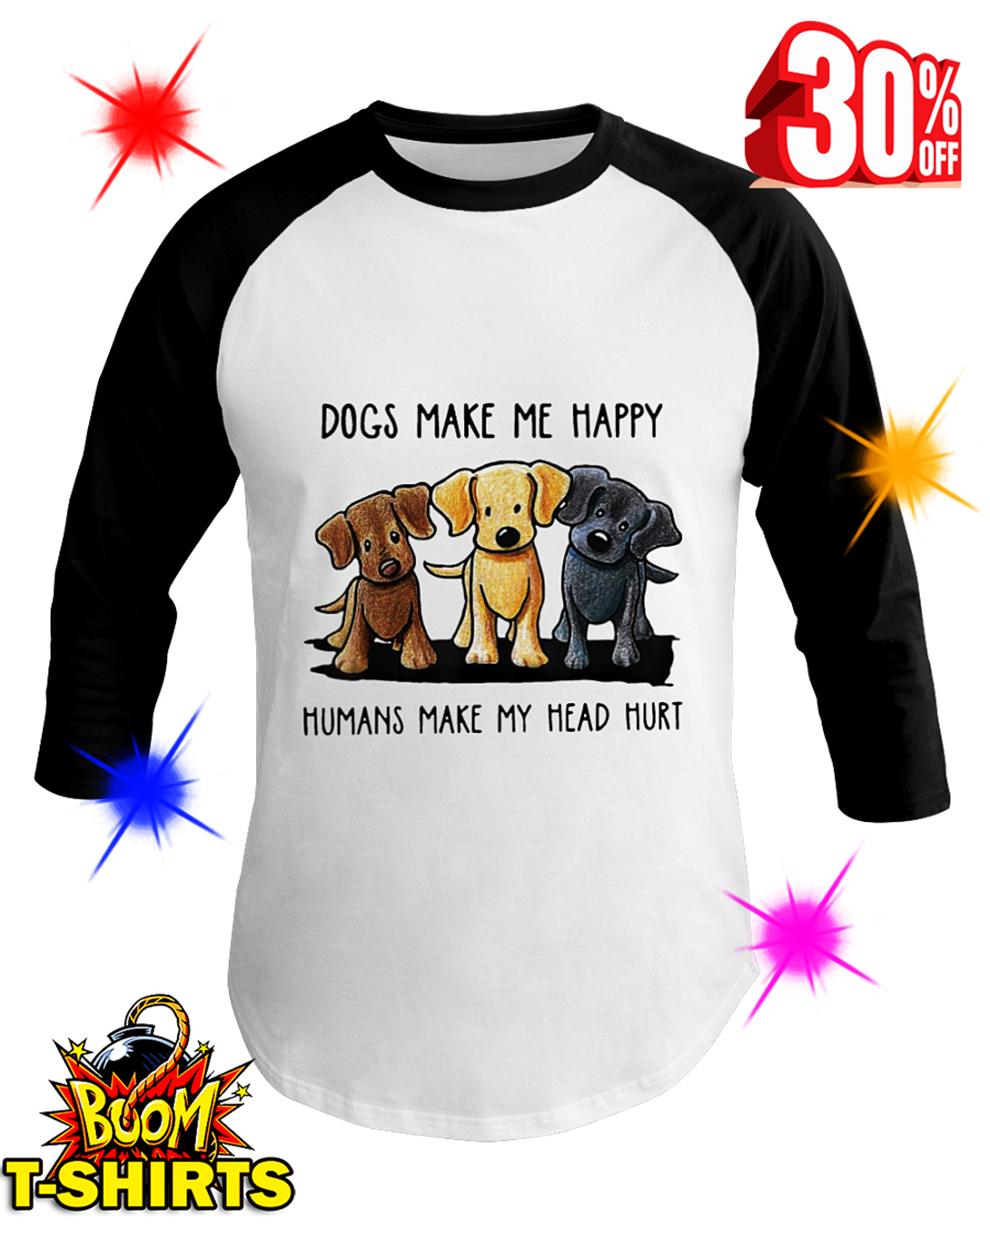 Dogs Make Me Happy Humans Make My Head Hurt baseball tee